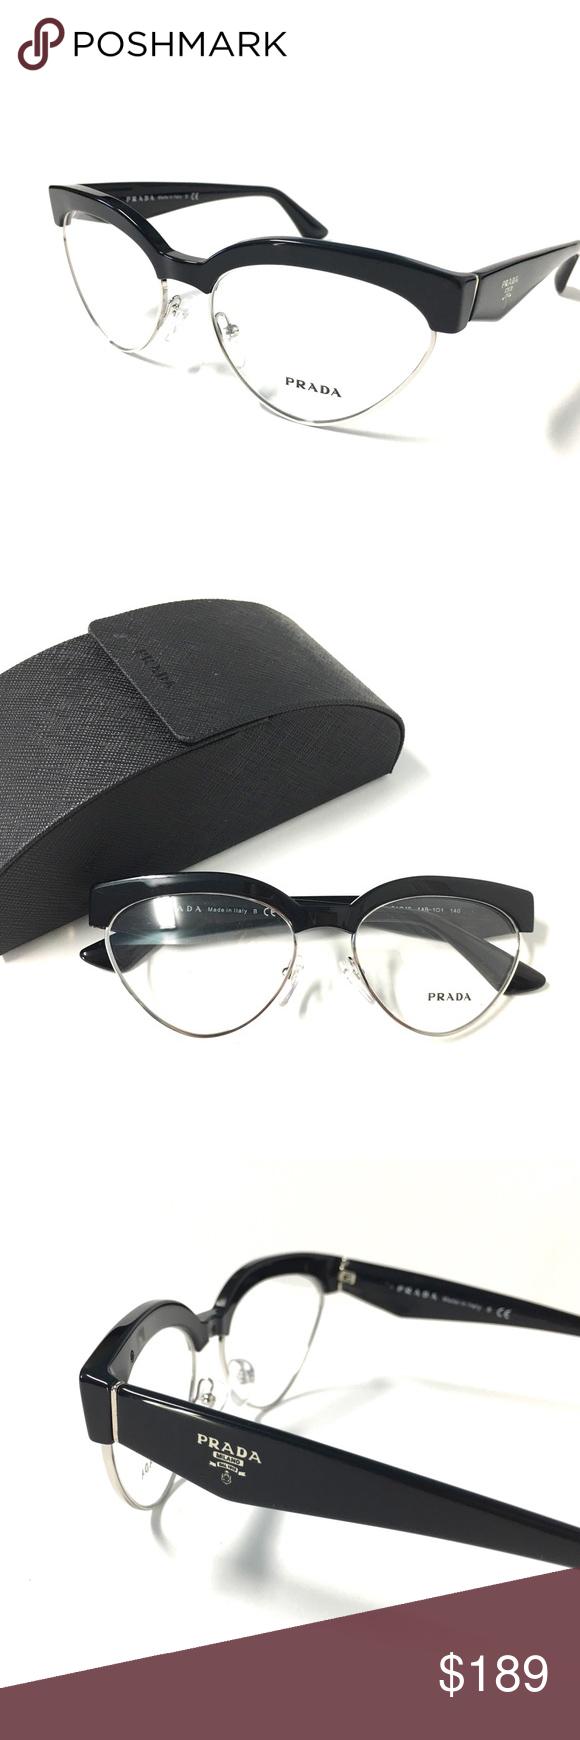 5e5d84eb293c New Women s Cat Eye Prada Eyeglasses Black Silver New Women s Cat Eye Prada  Optical Frame Black Silver Includes Prada Case only! 54-16-140 100%  Authentic ...